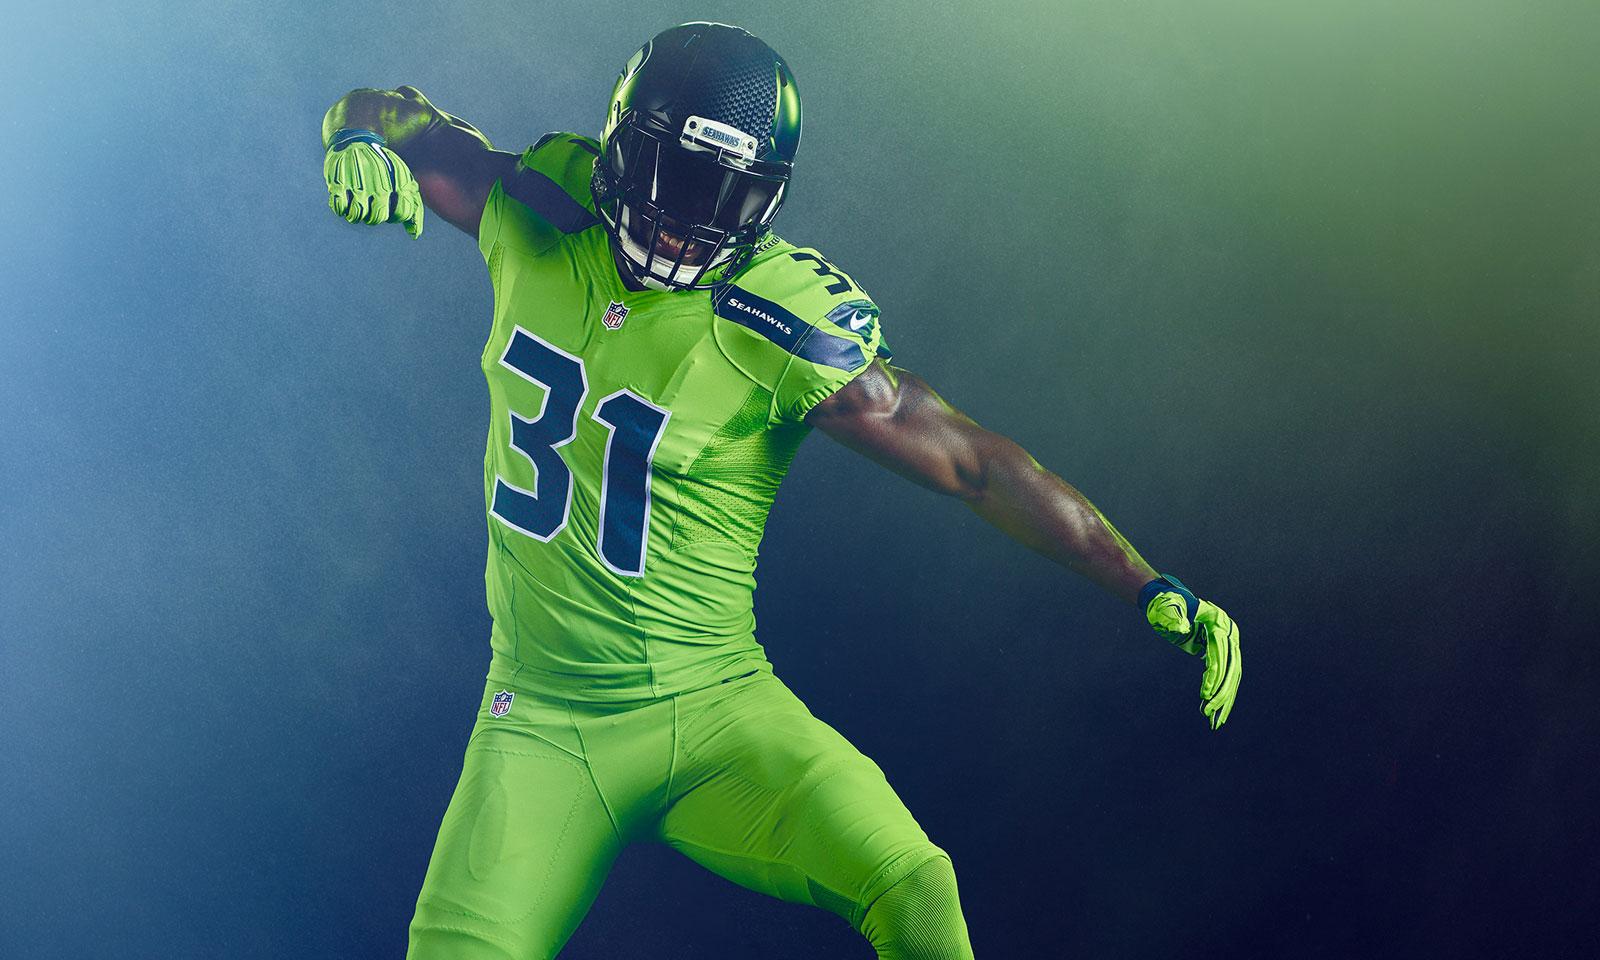 Football to Fashion